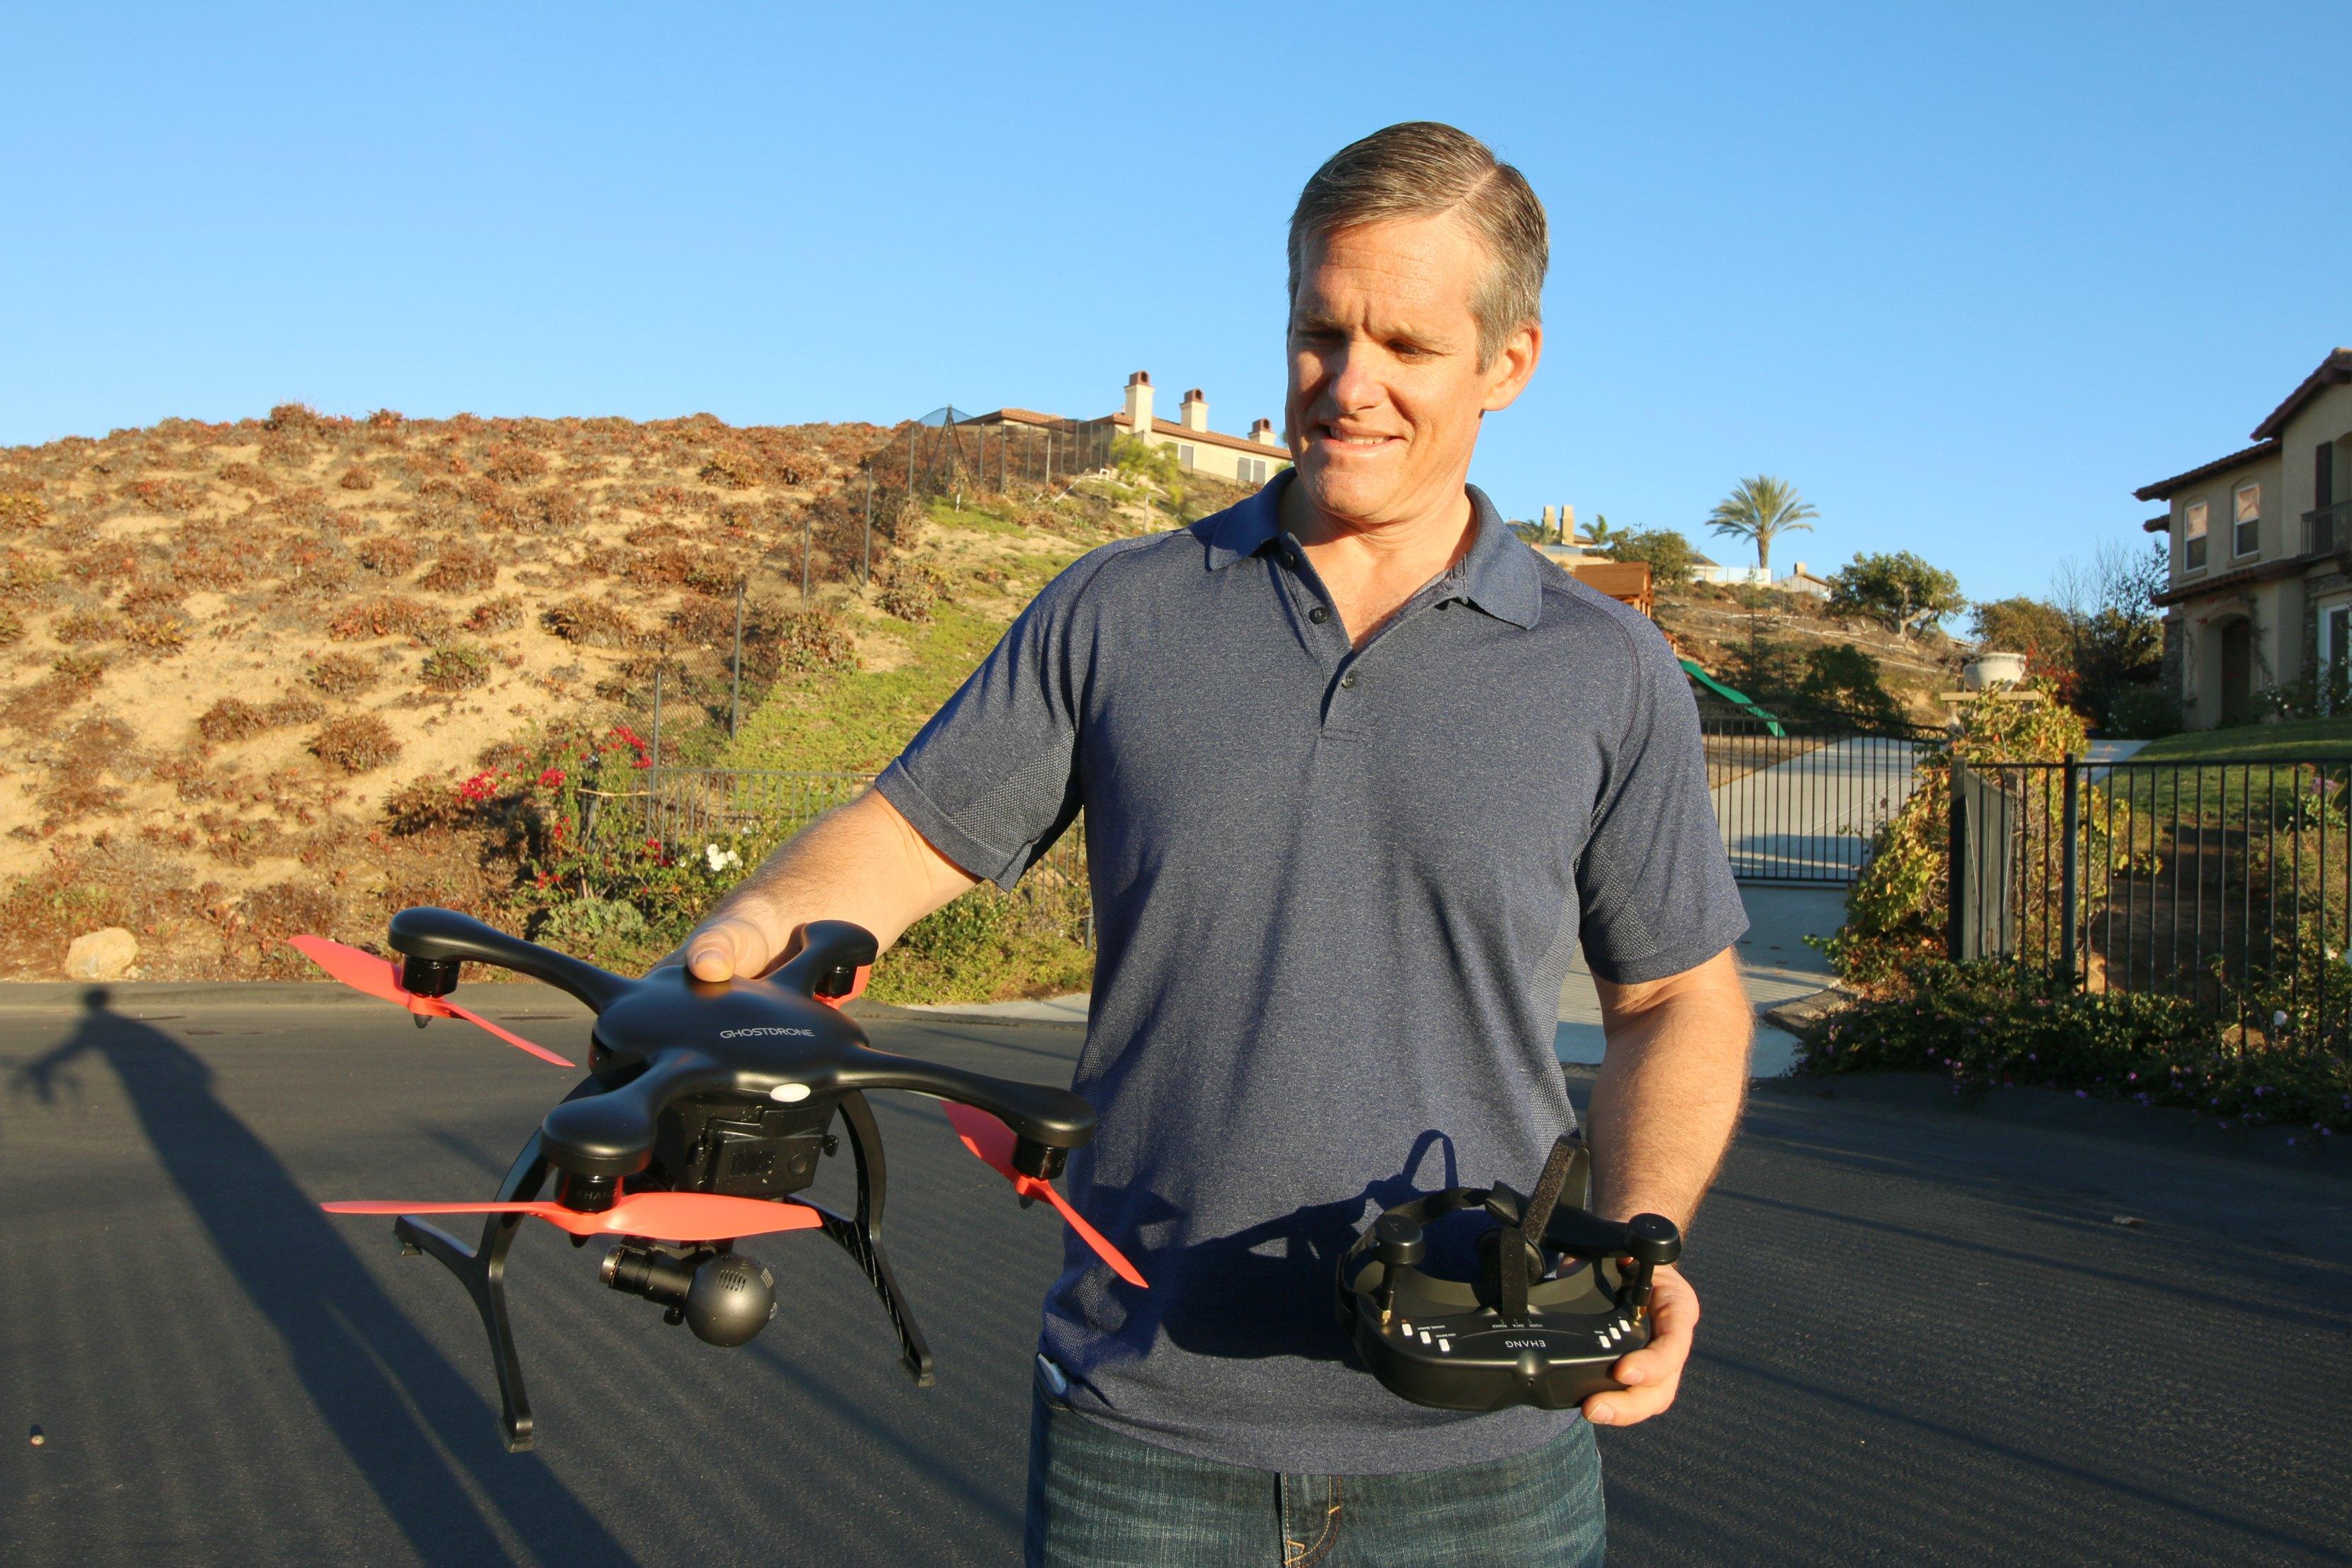 ghostdrone-2-0-review